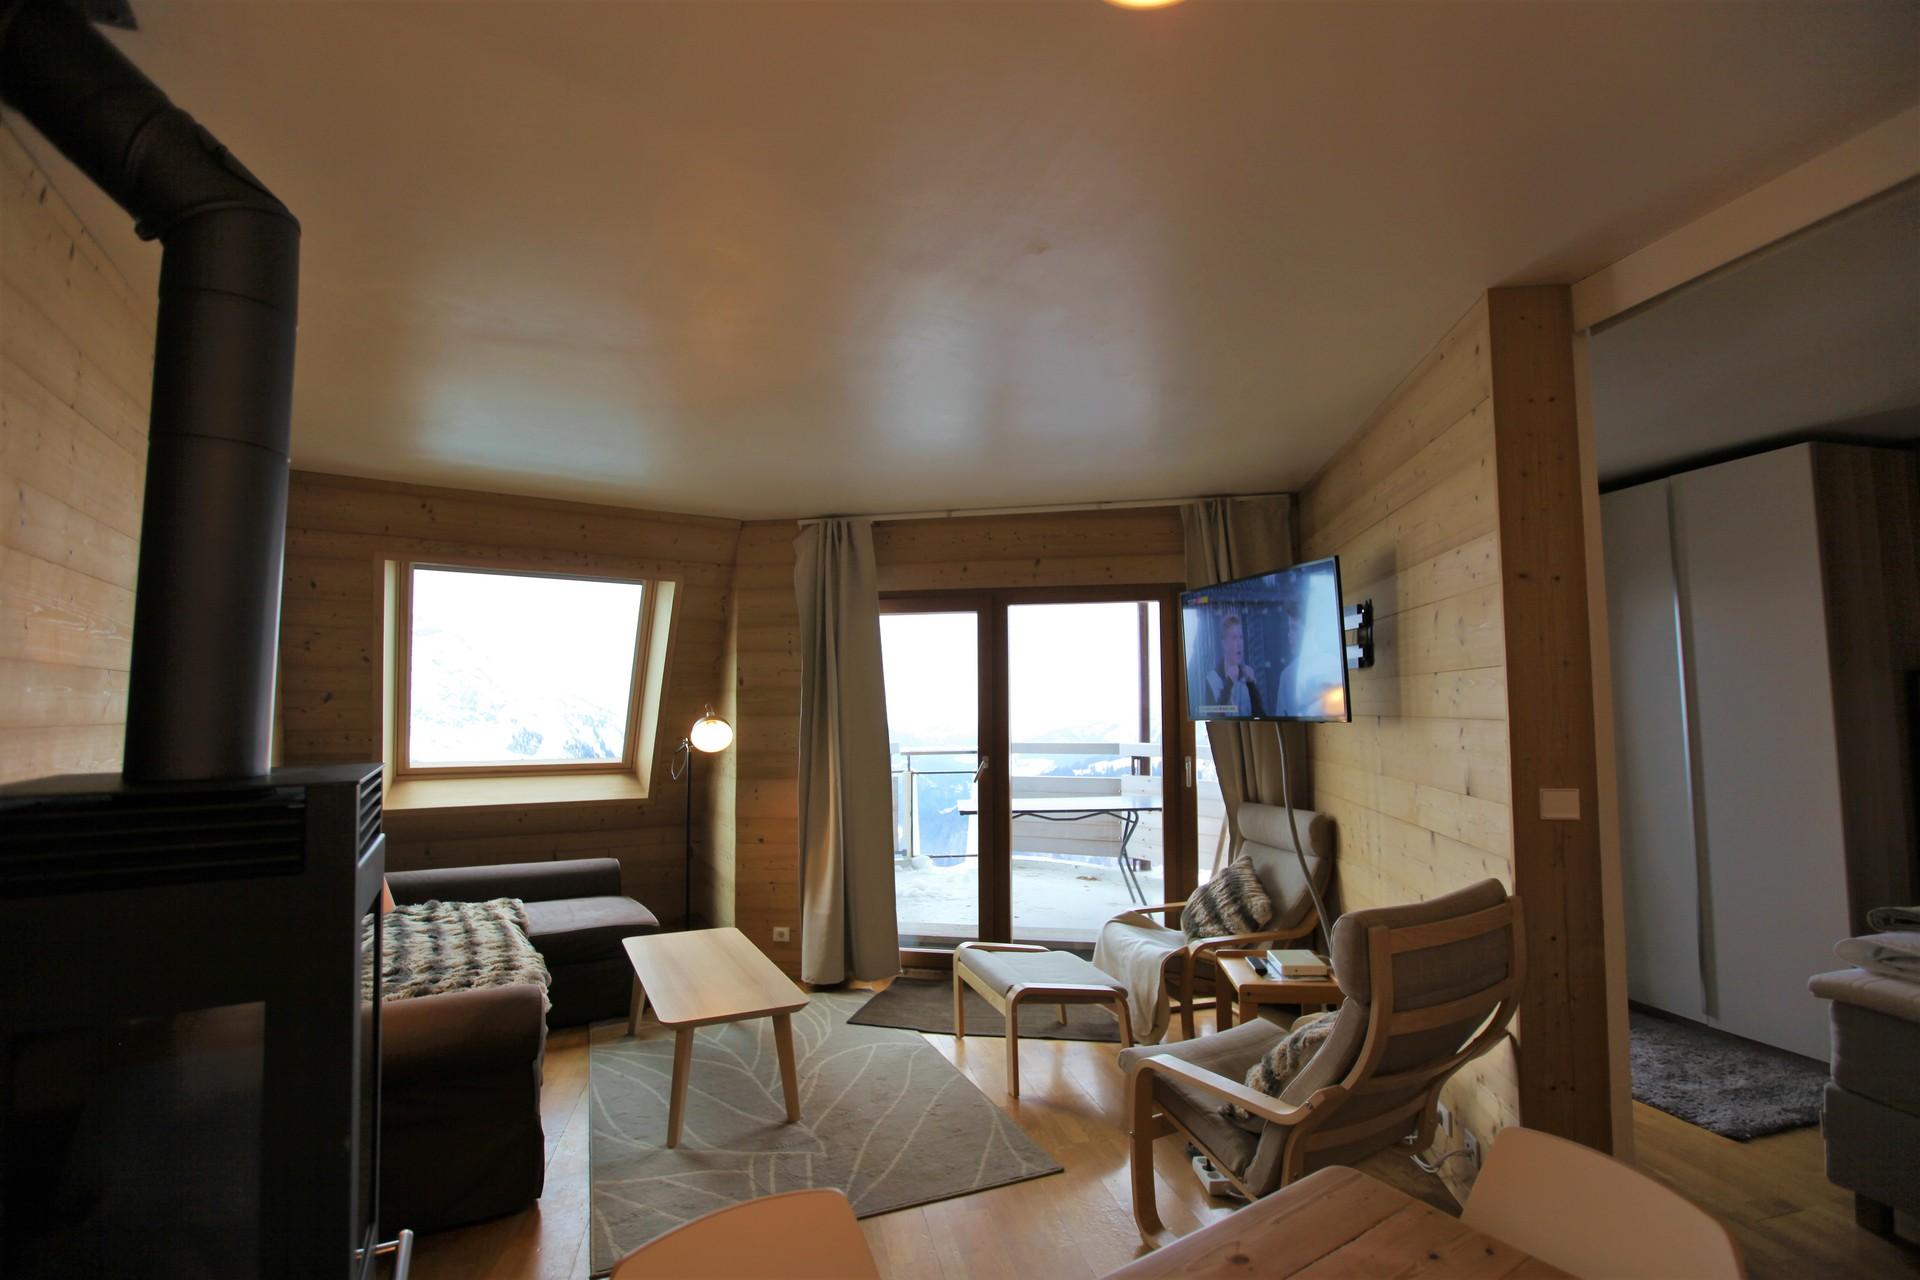 Rent a 3-rooms-(2-bedrooms) at Avoriaz